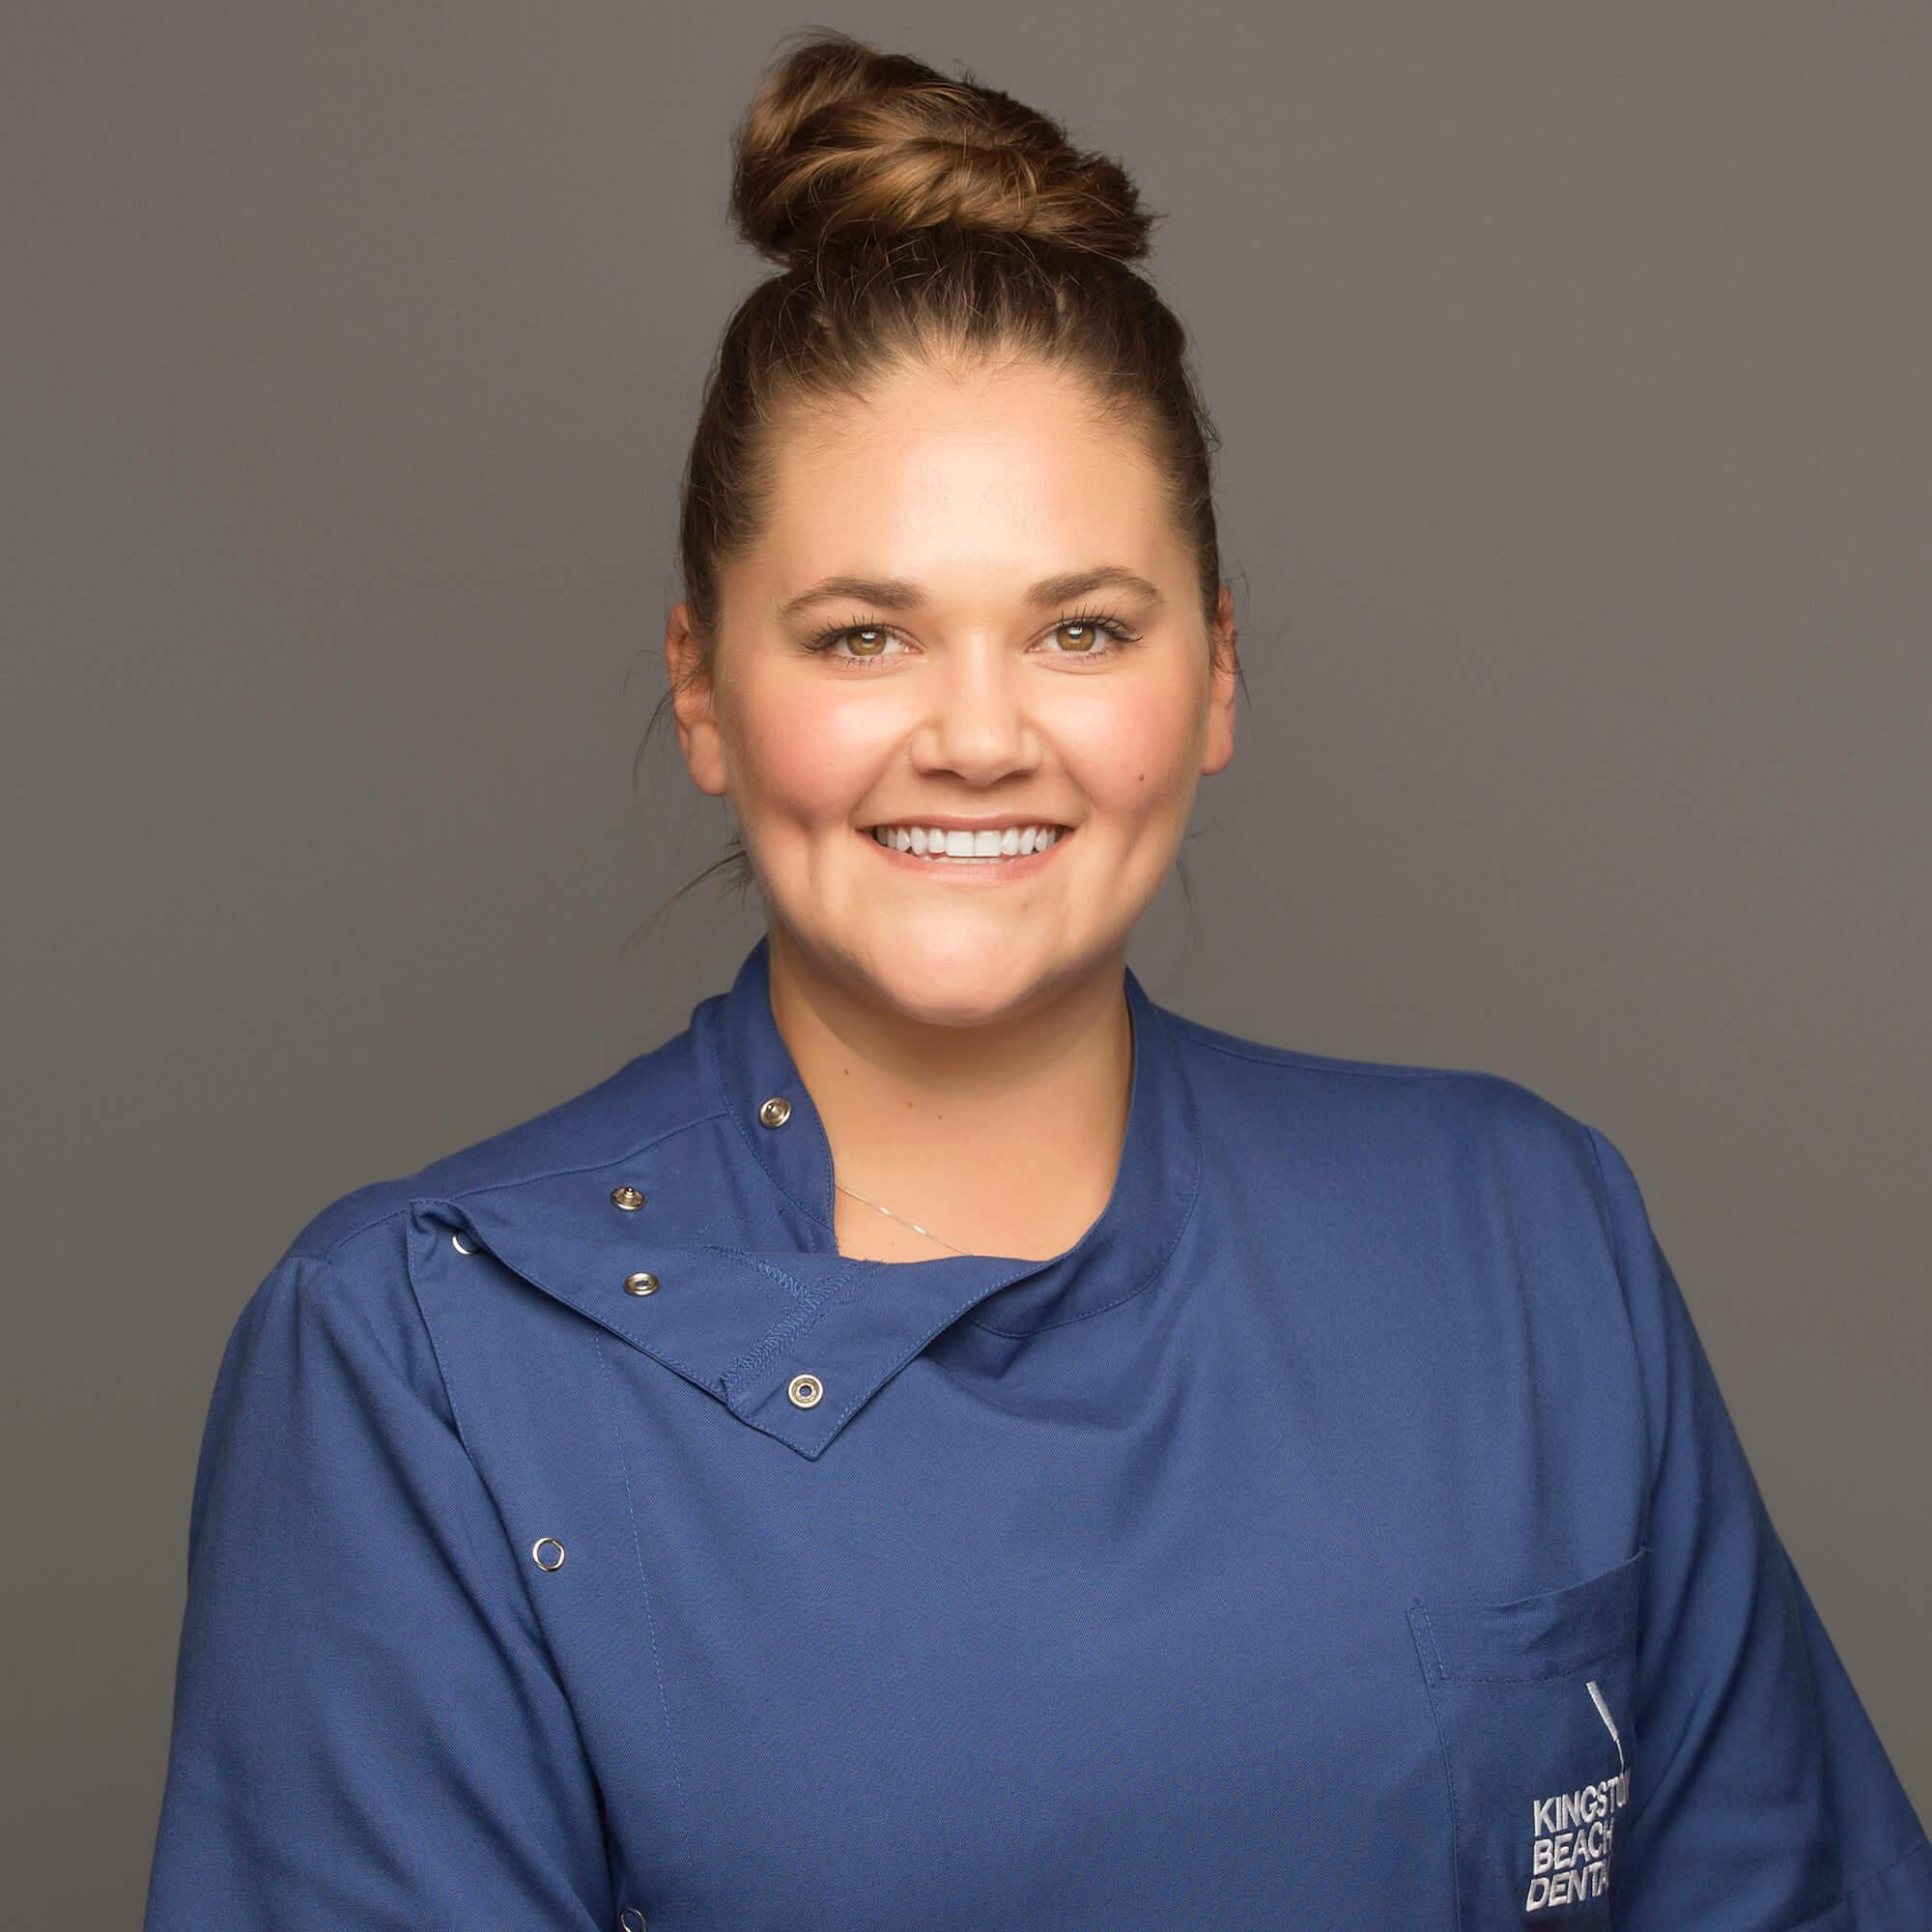 Hannah Colantoni Kingston Beach Dental - pain free hygenist in Hobart